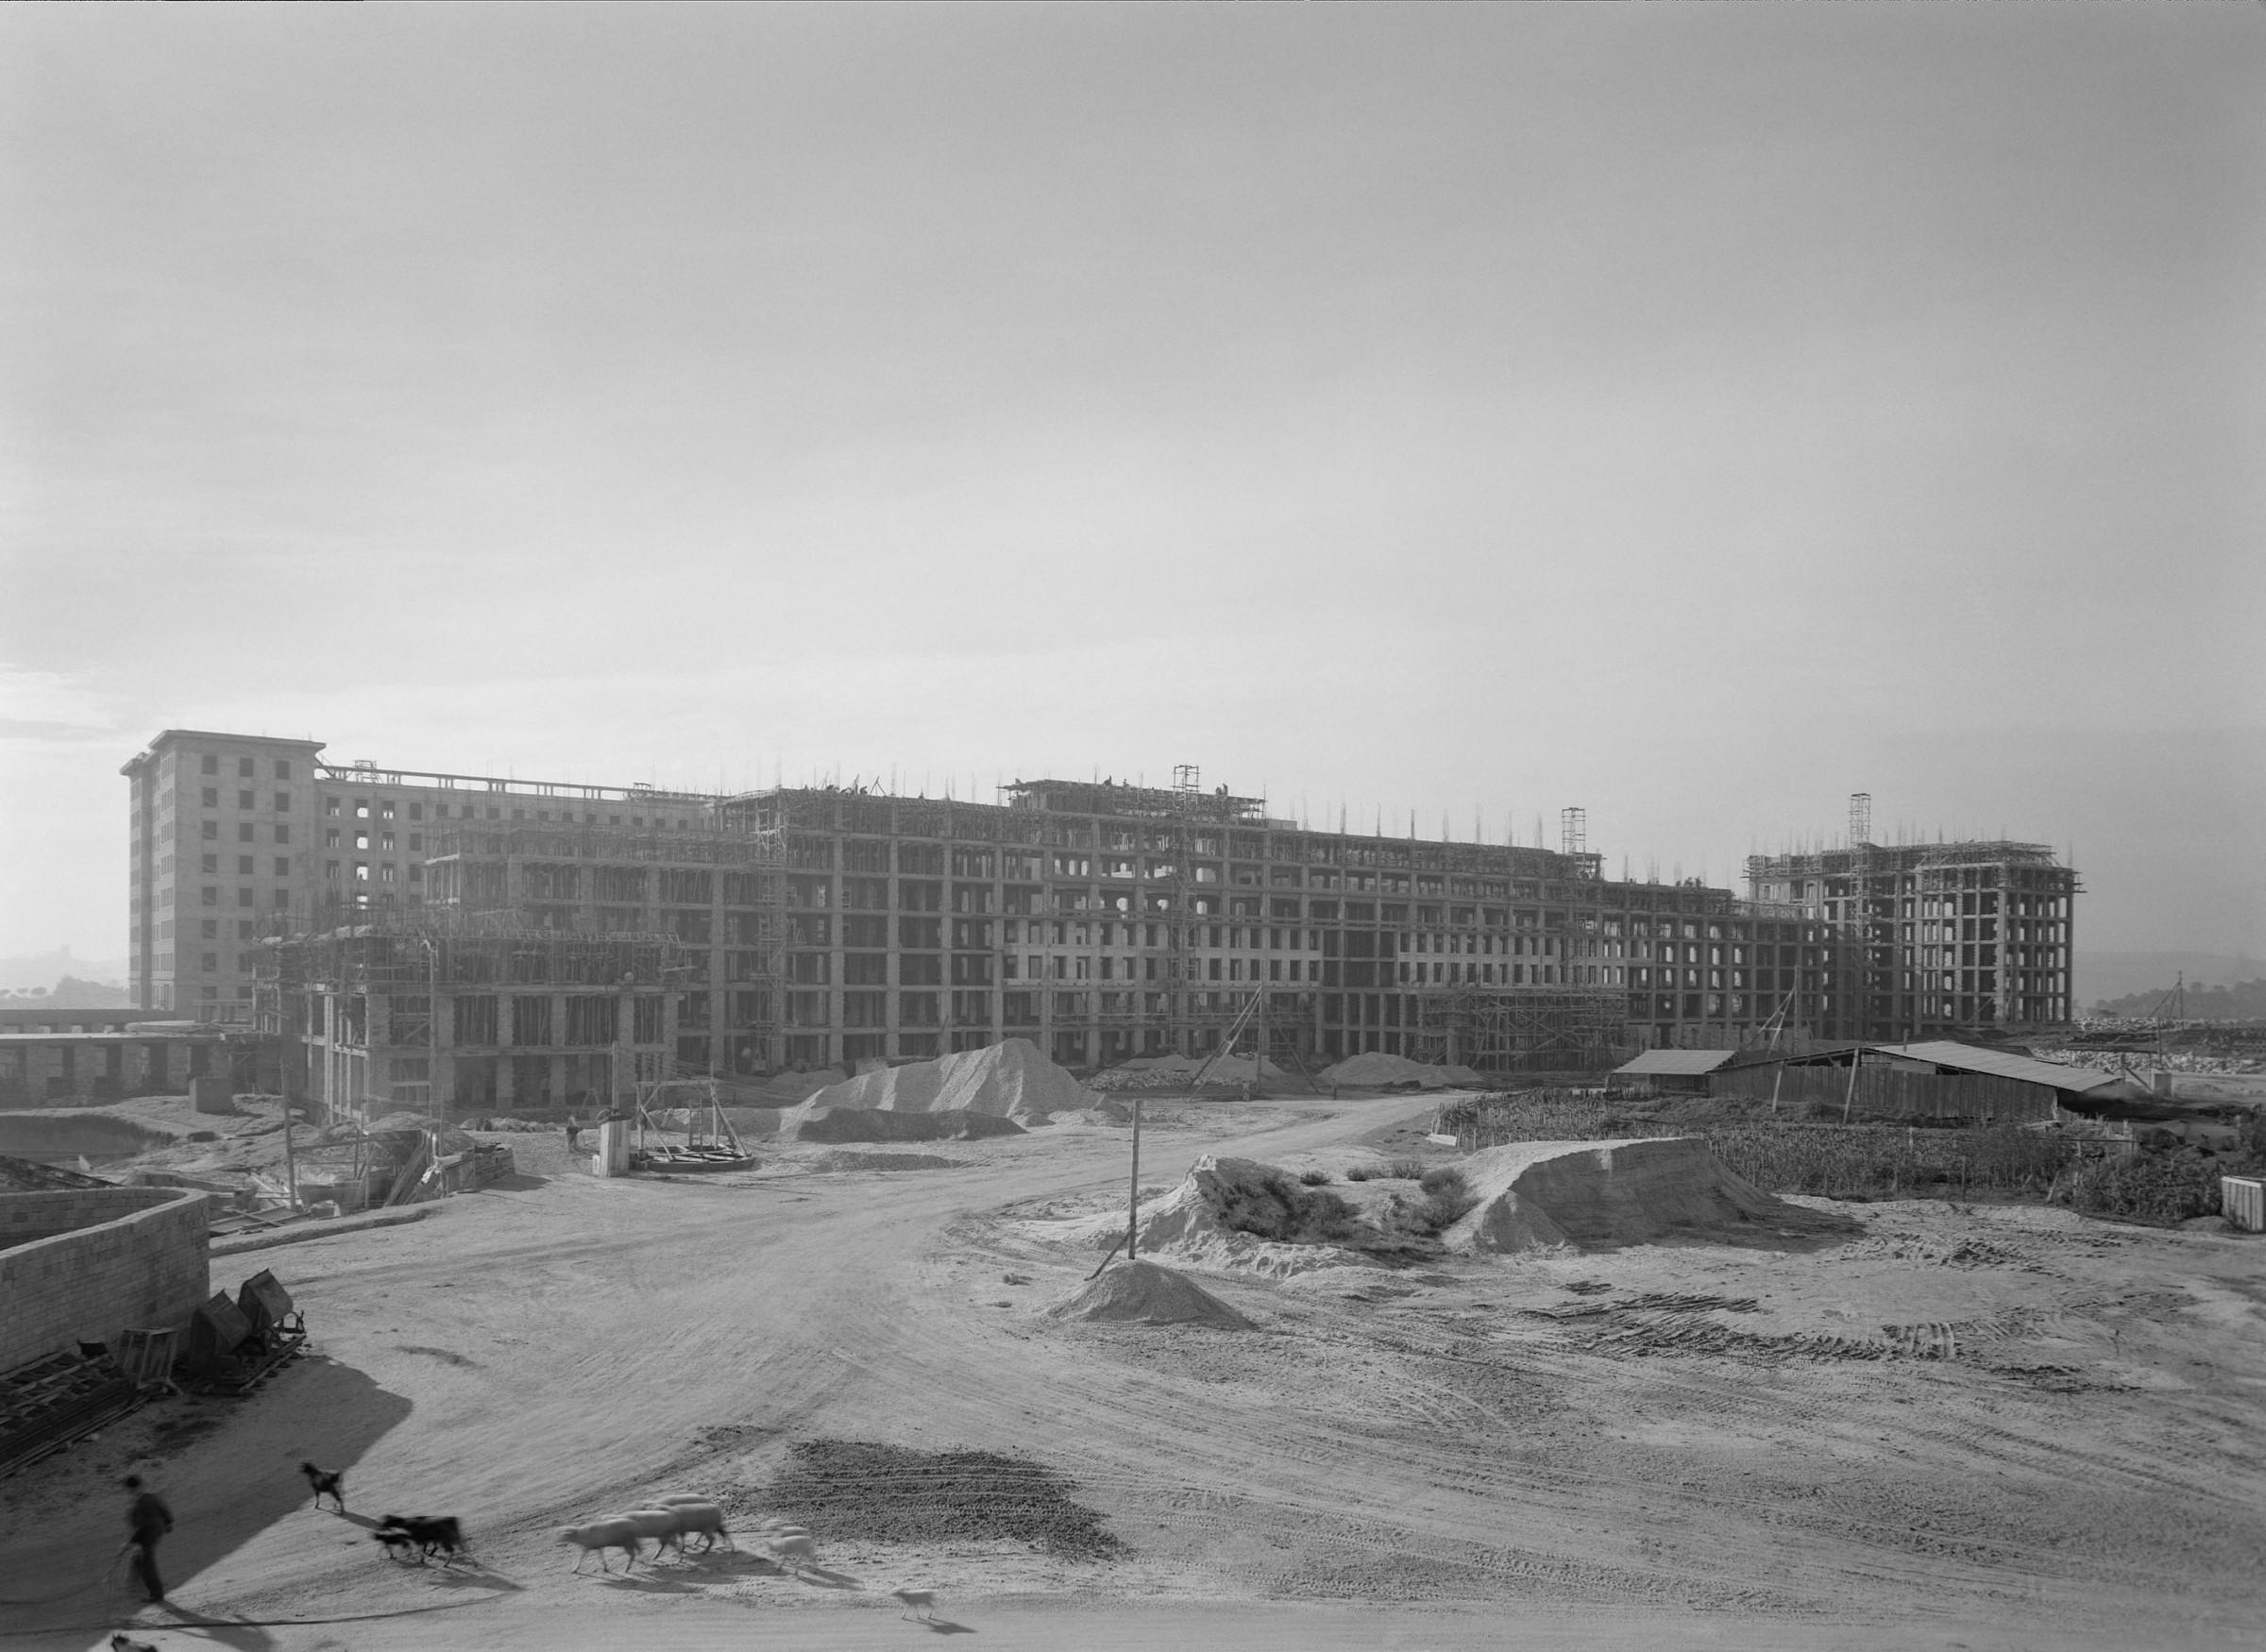 03-construc3a7c3a3o-hsm-1950.jpg